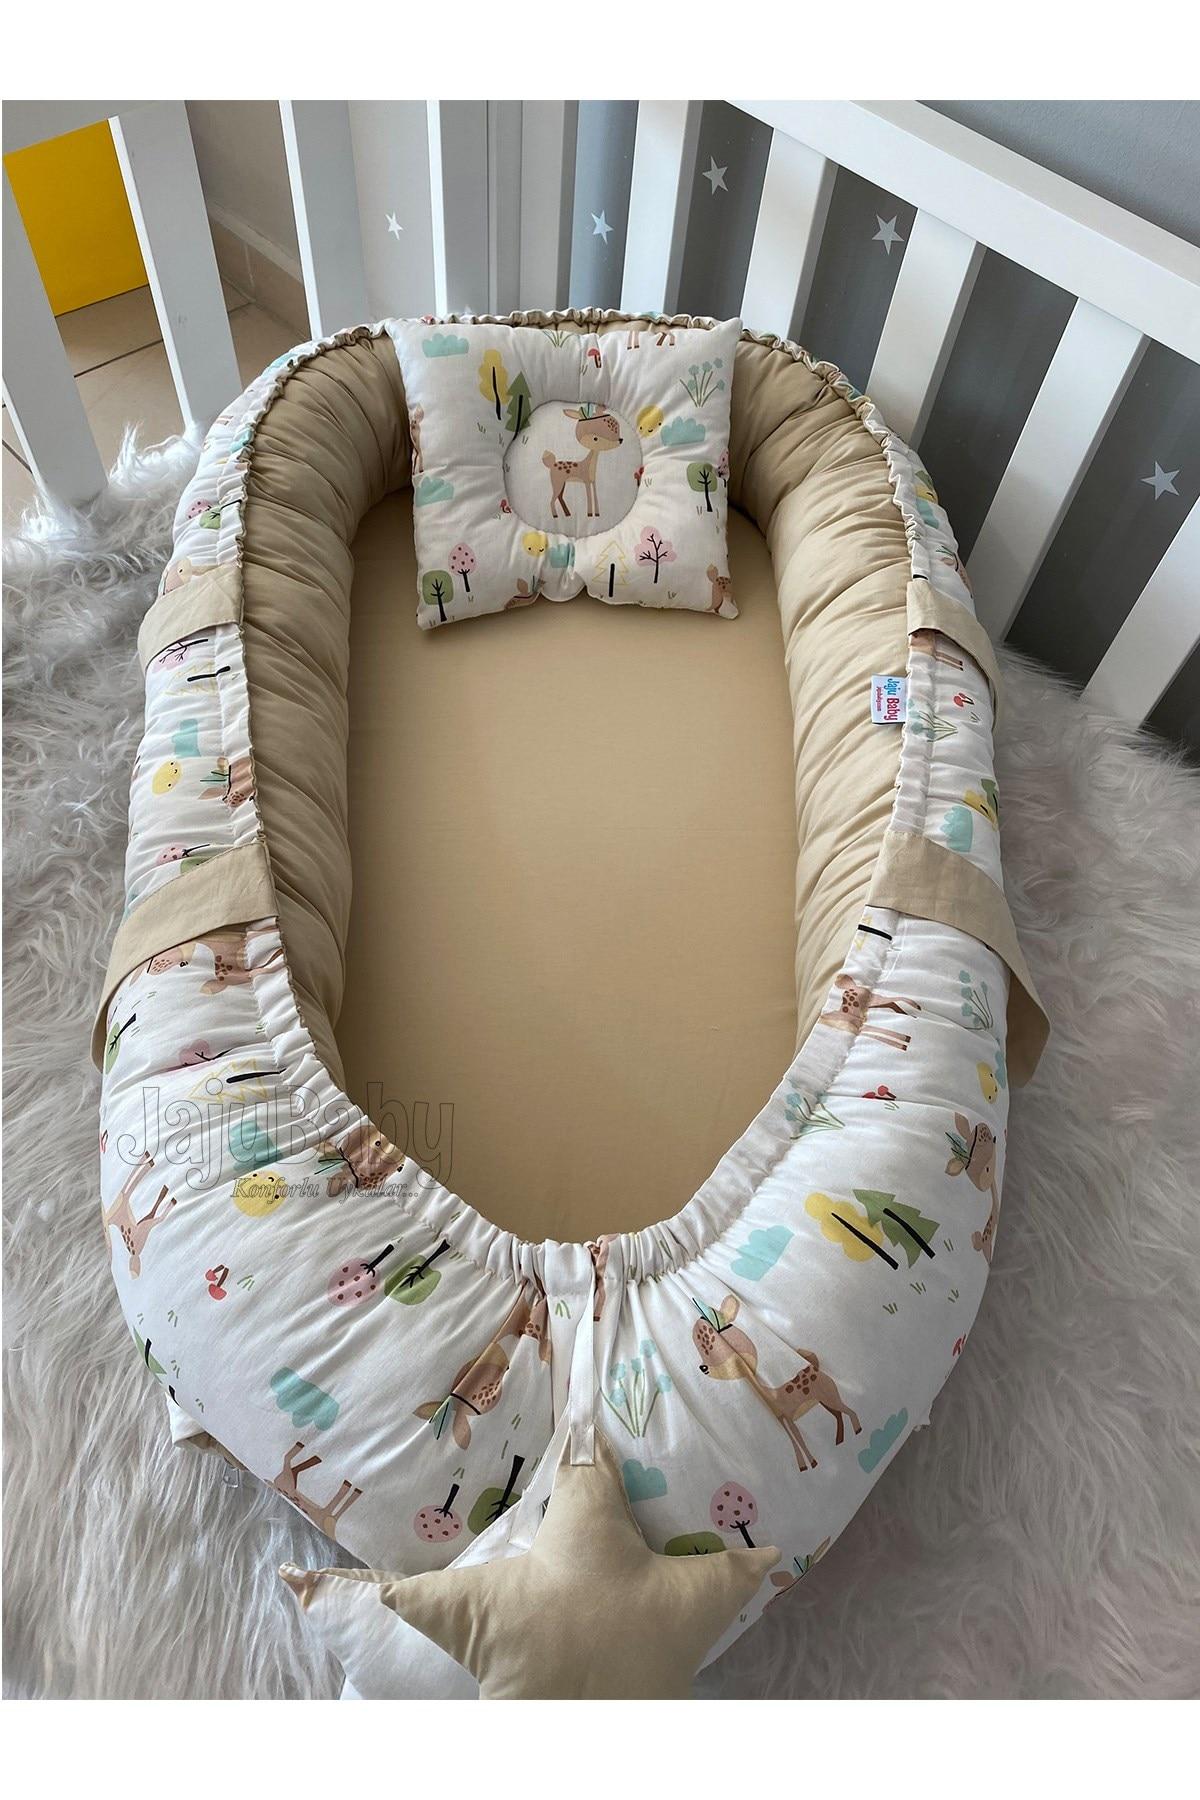 Jaju Baby Special Handmade Cute Ceylan Luxury Design Babynest